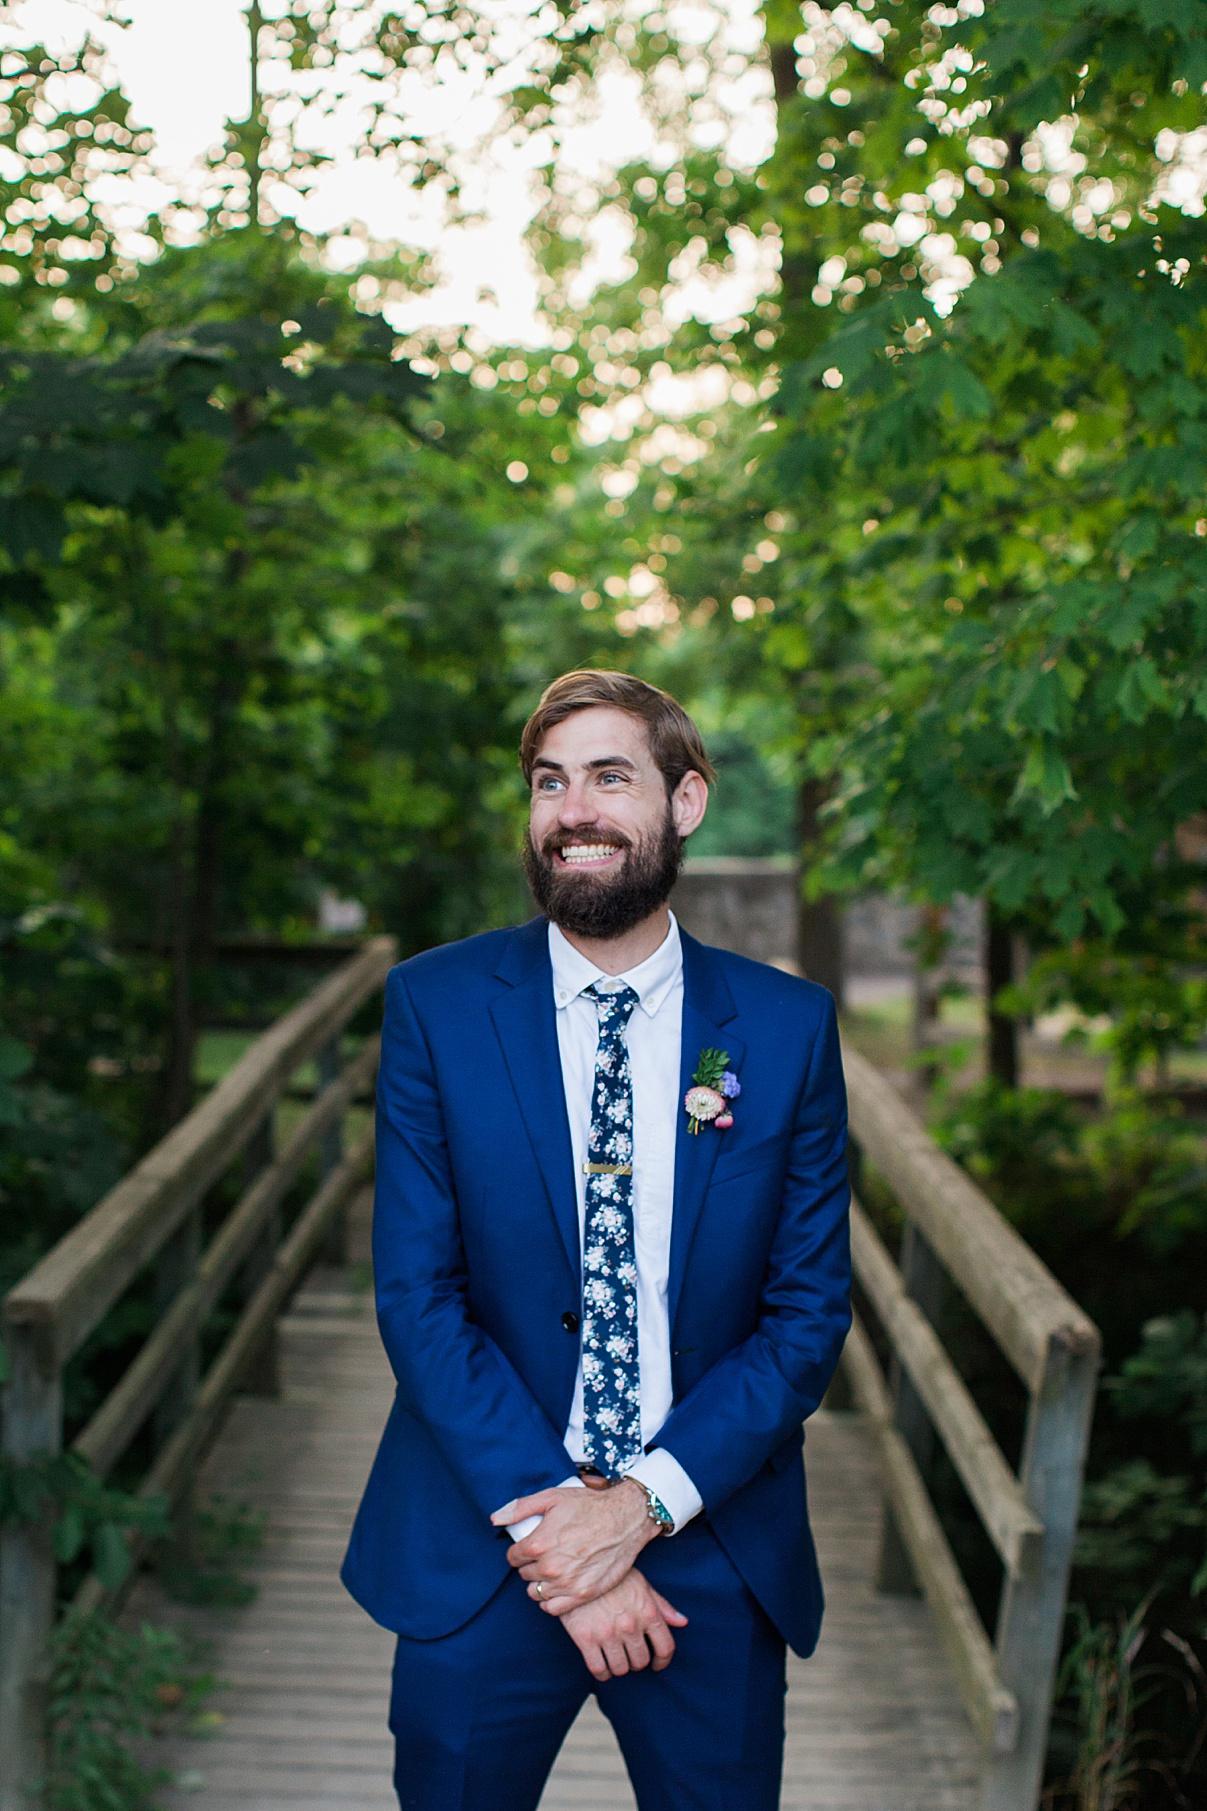 Groom portrait smiling | Balls Falls, Ontario Wedding| Ontario Wedding Photographer| Toronto Wedding Photographer| 3Photography| 3photography.ca